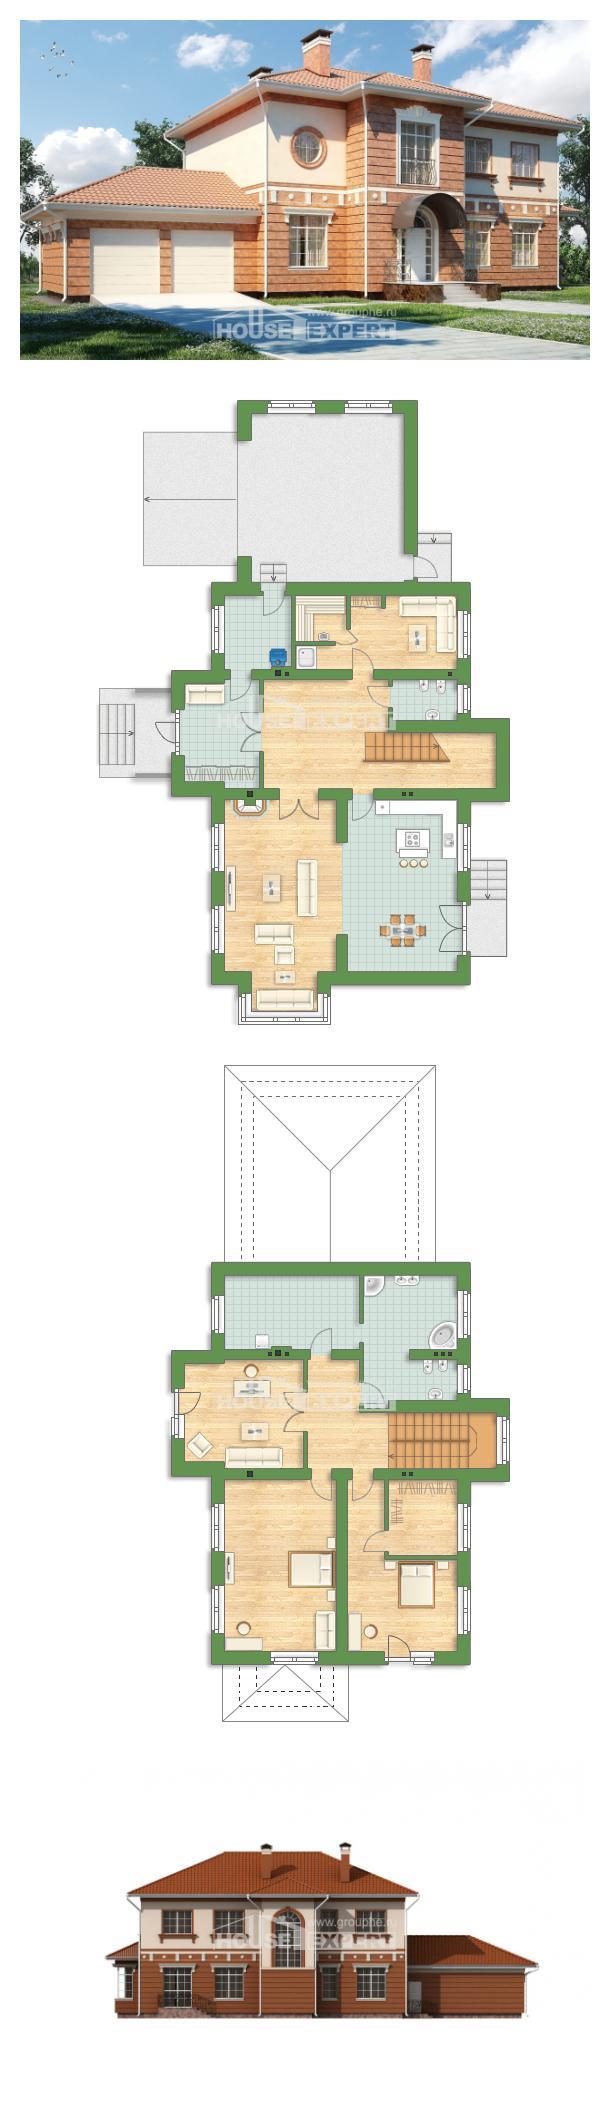 Проект дома 285-001-Л | House Expert